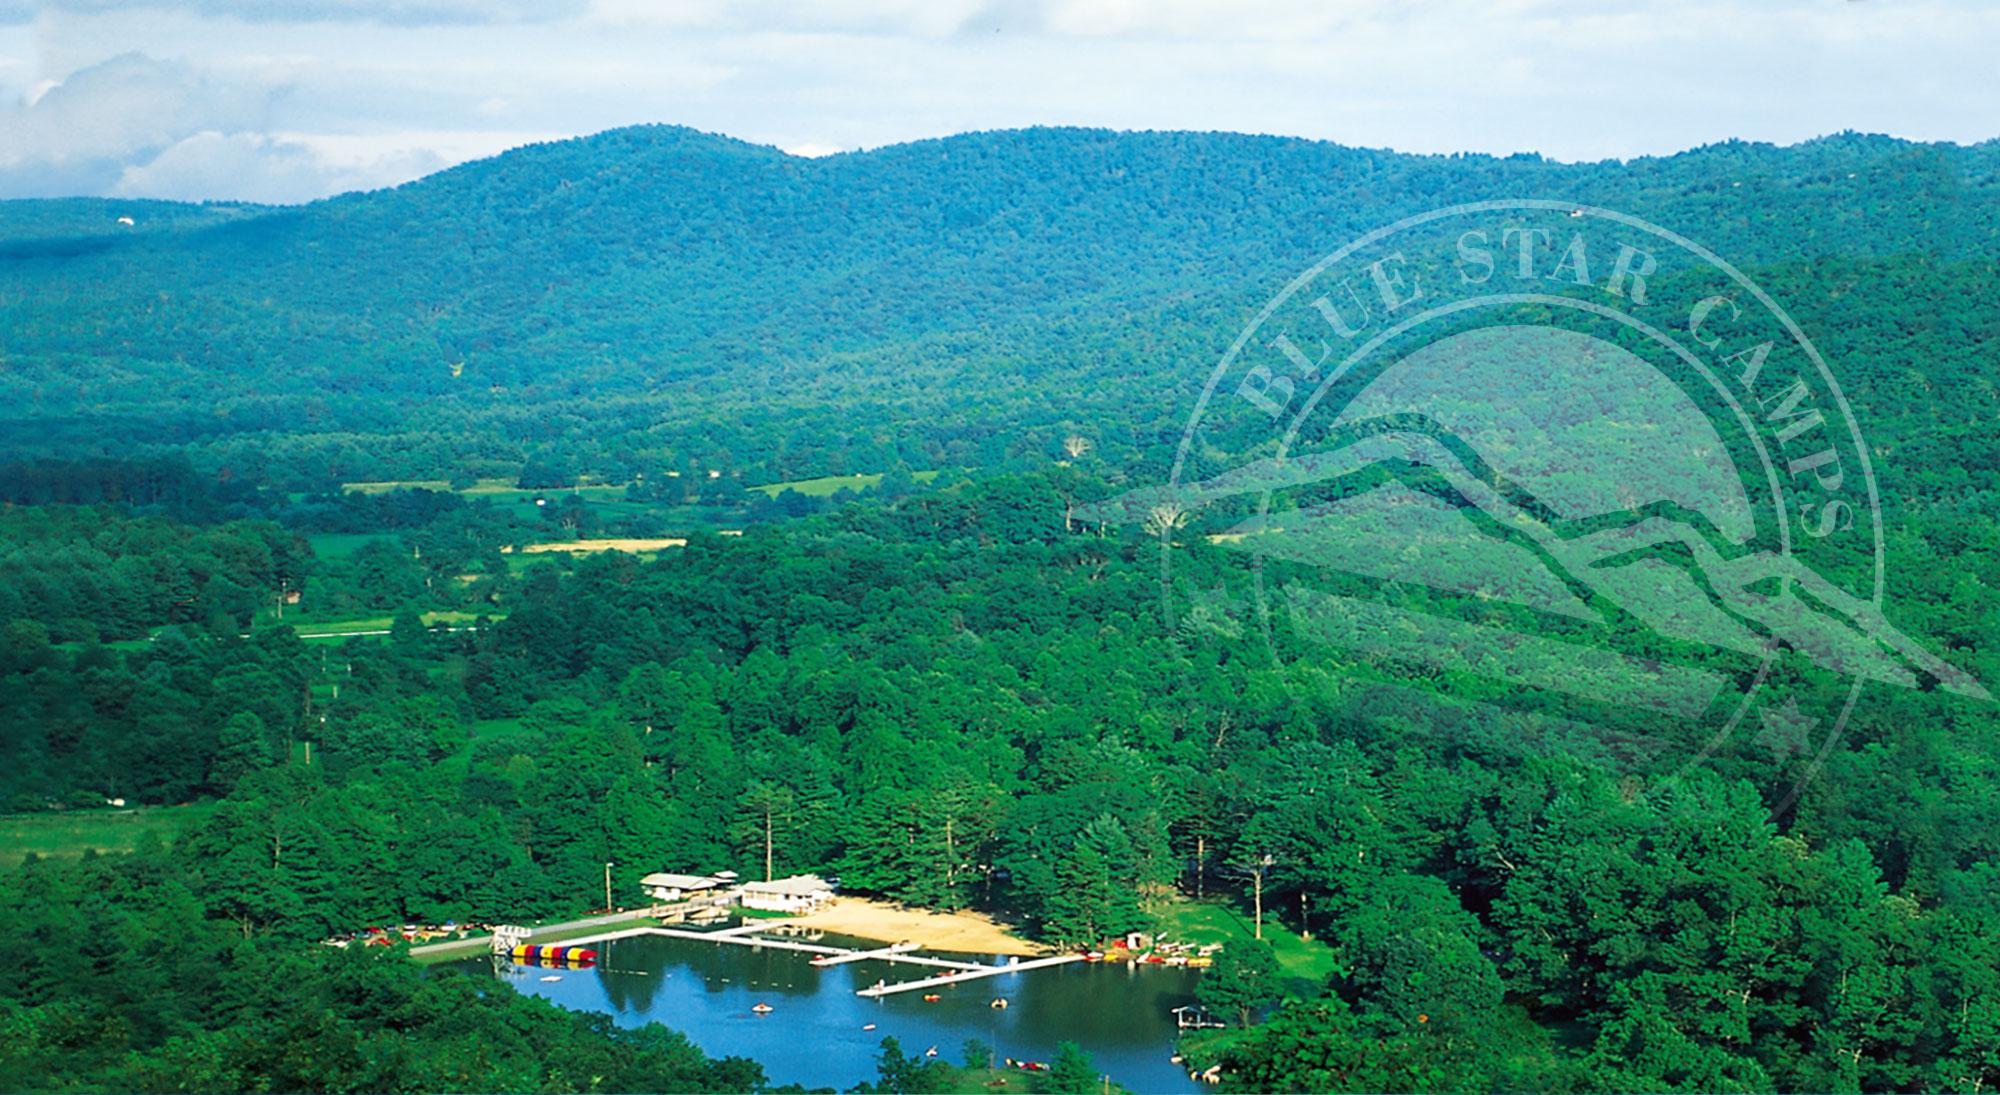 Blue Star Camps North Carolina Coed Summer Camp